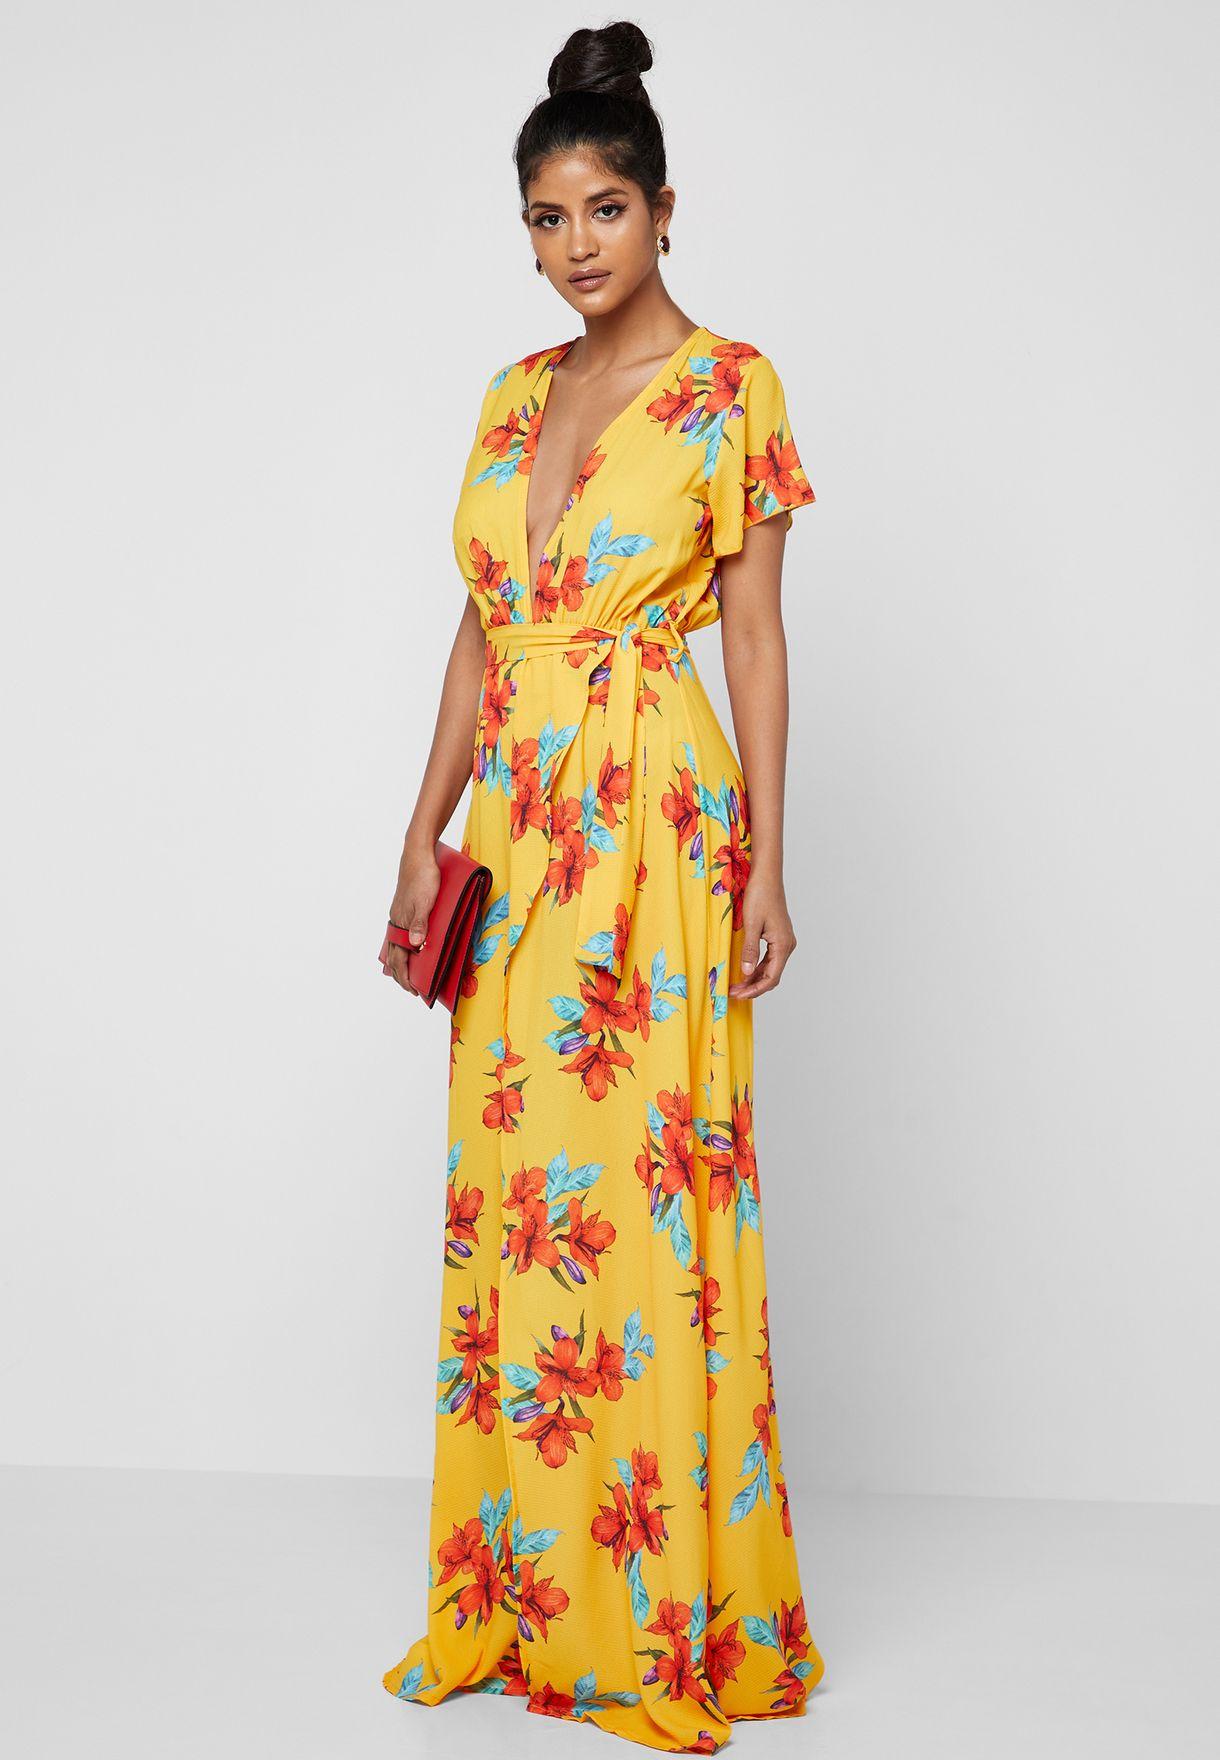 8a68f7eb3ba Shop Ginger prints Floral Print Plunge Neck Self Tie Maxi Dress 7191 ...